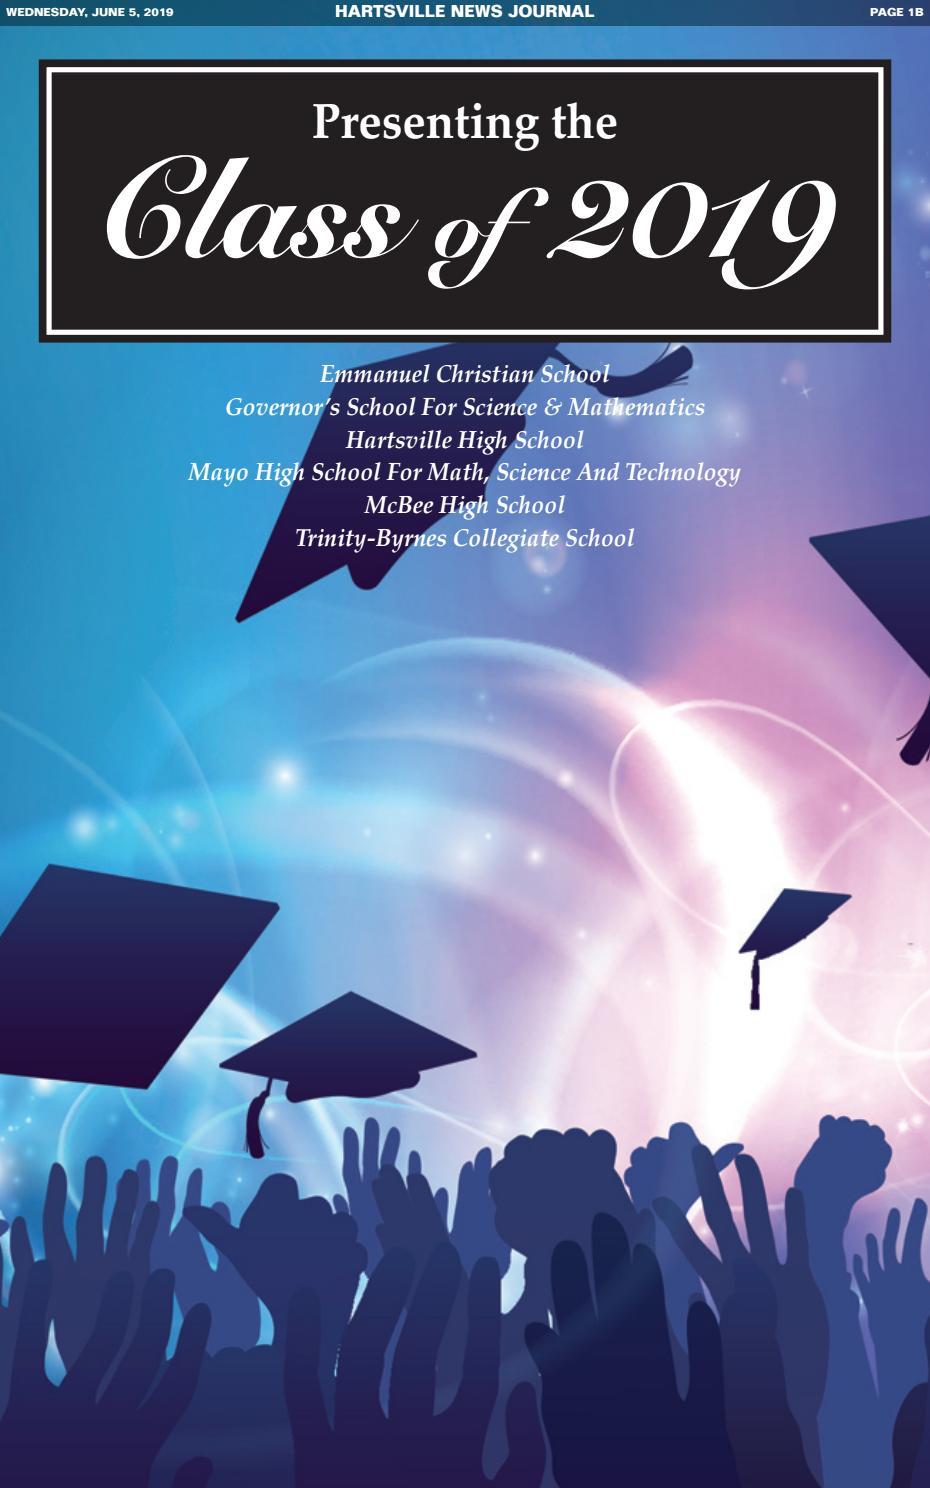 Grad Tab 6/5/19 by The News Journal - issuu